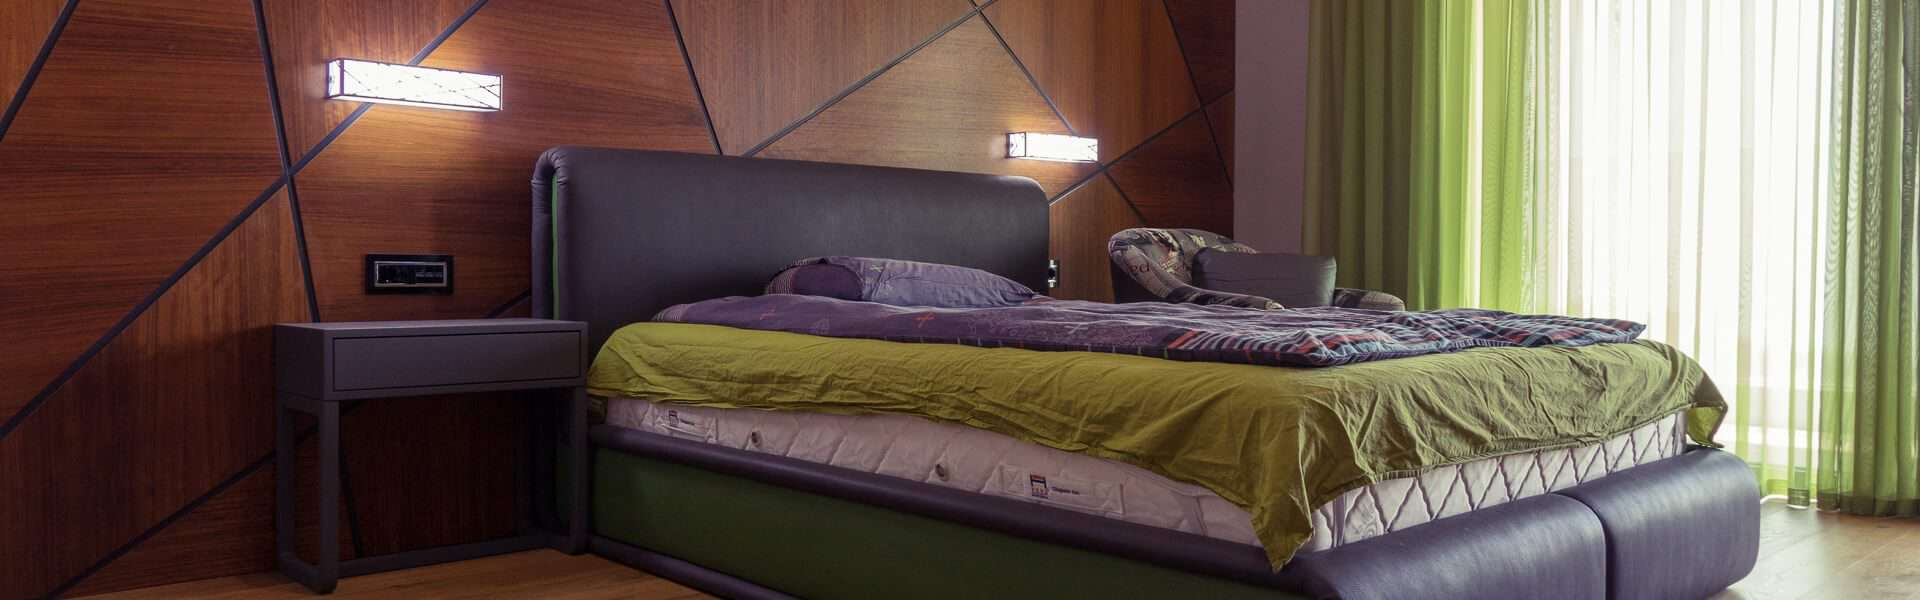 модерна спалня интериорна фотография